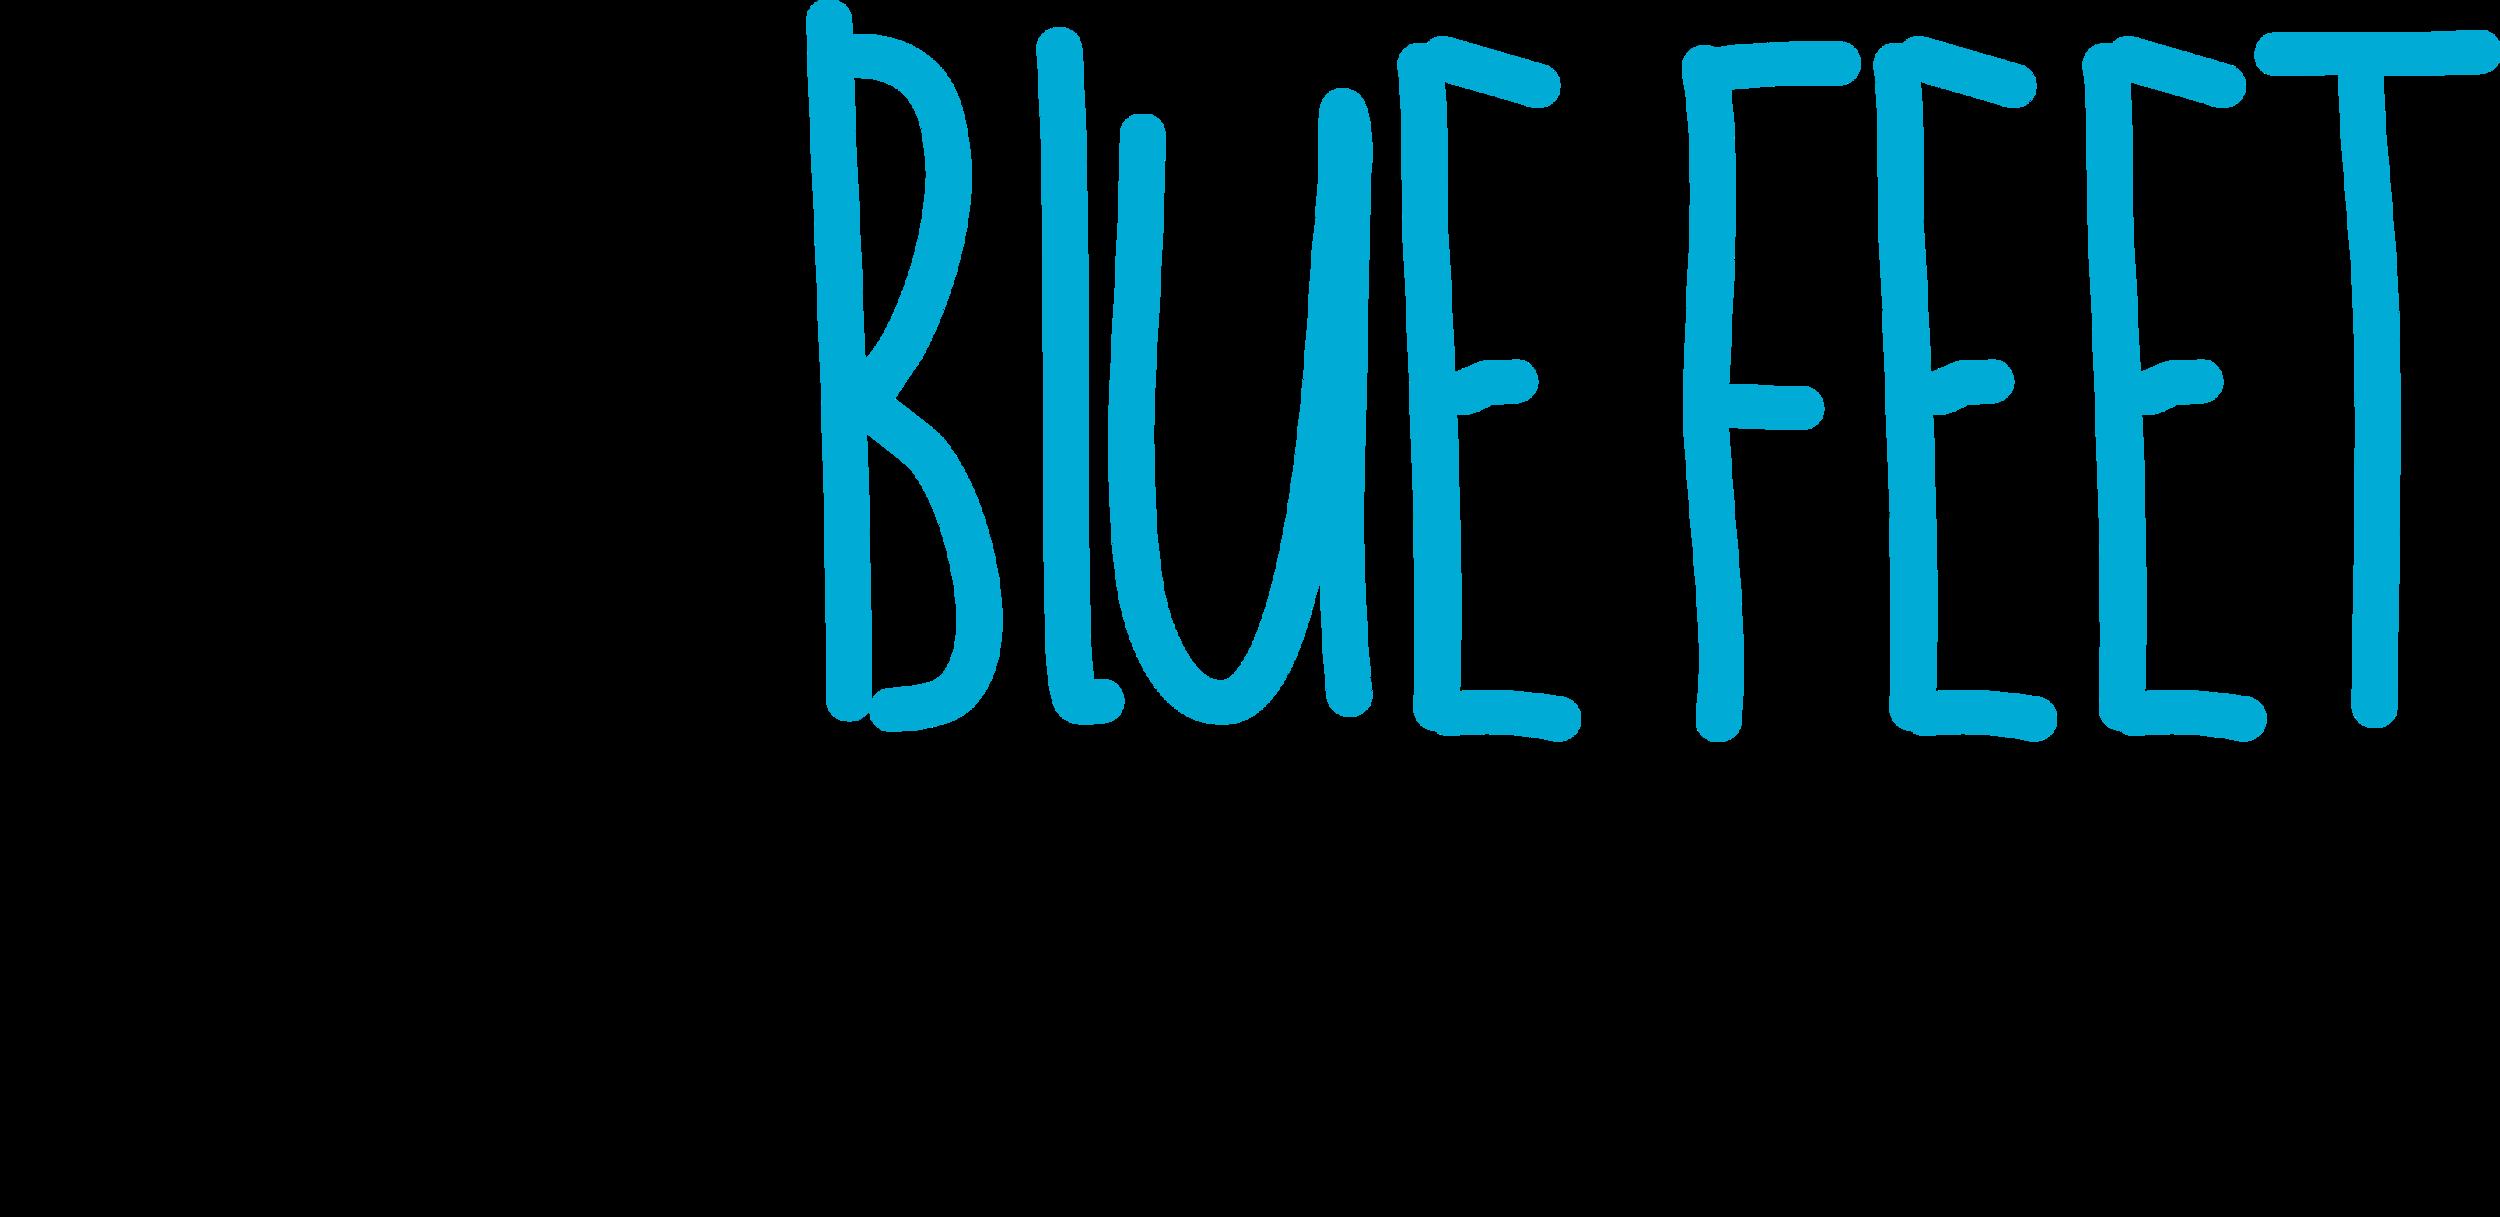 bluefeetlogo(COPYONLYTRANSPARENT).png